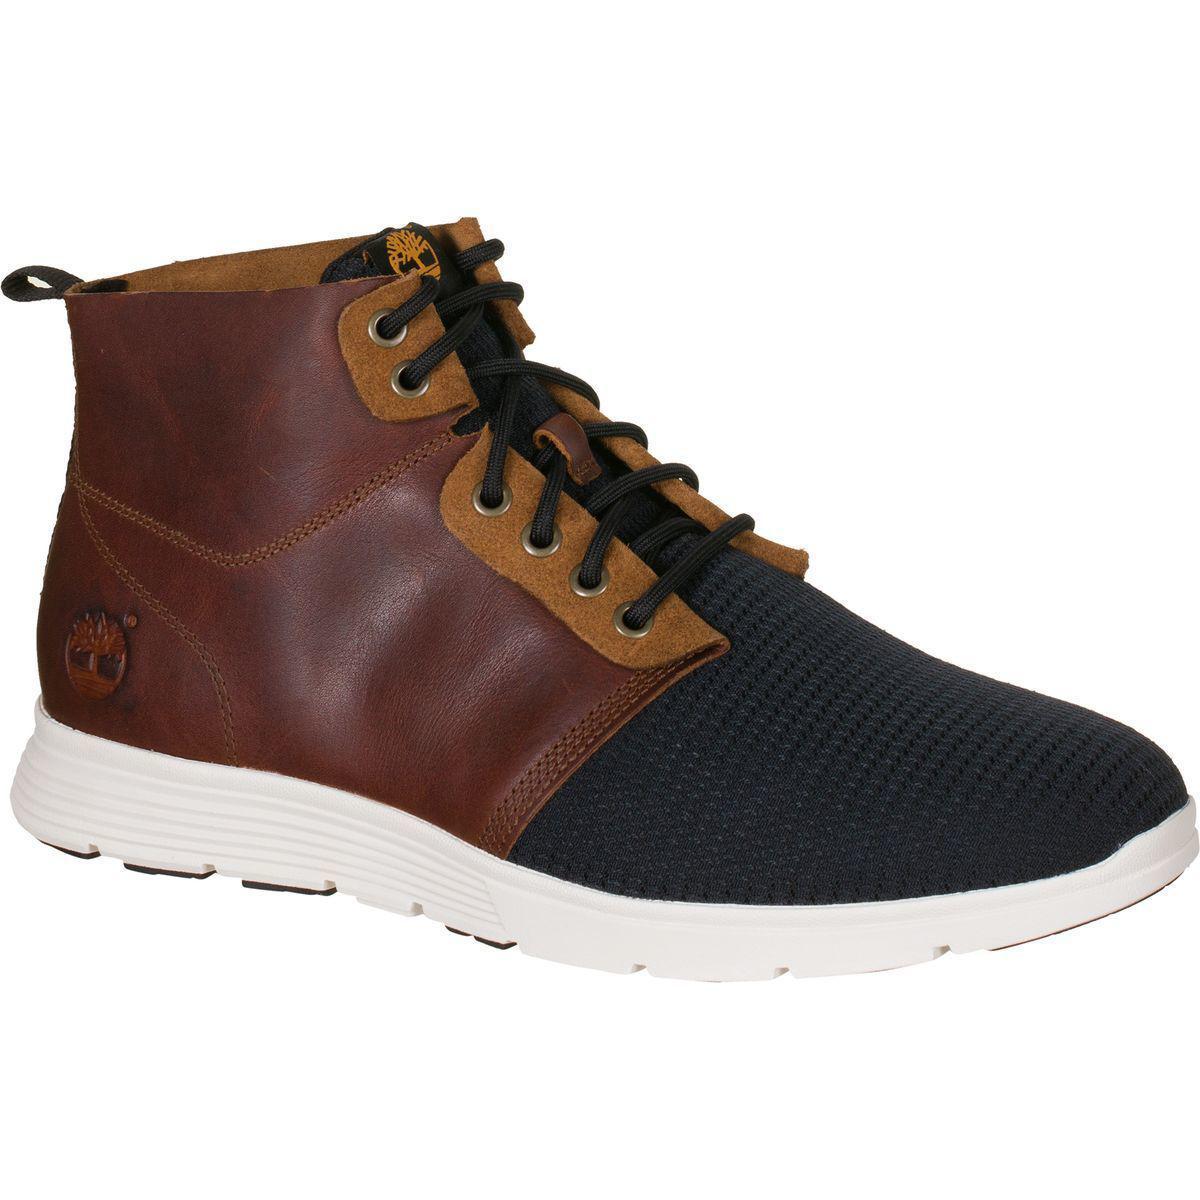 Timberland Killington Leather Amp Fabric Chukka Boot In